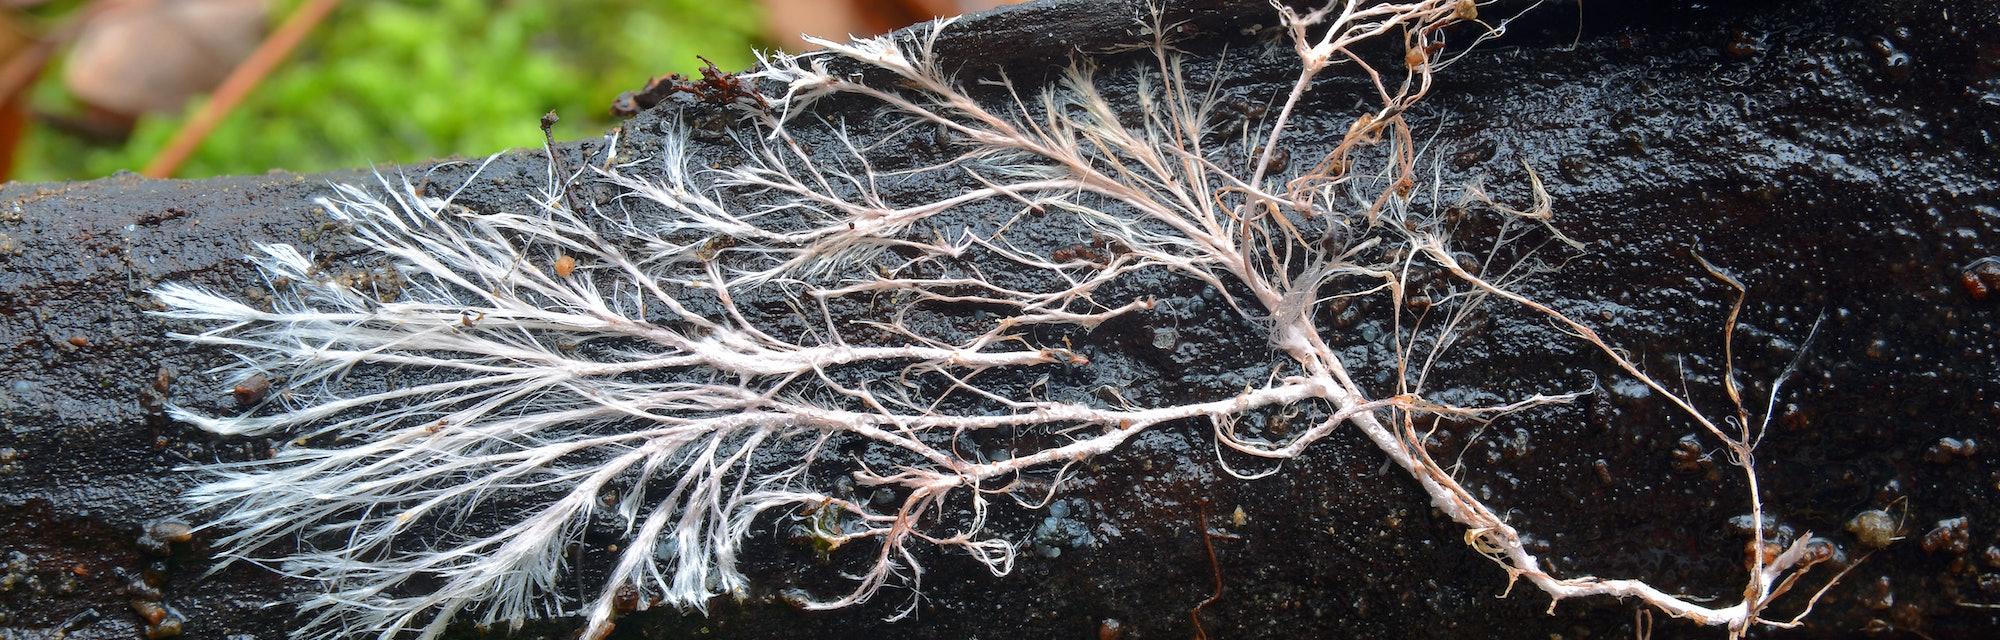 rizomorph mycelial cord on dead wood